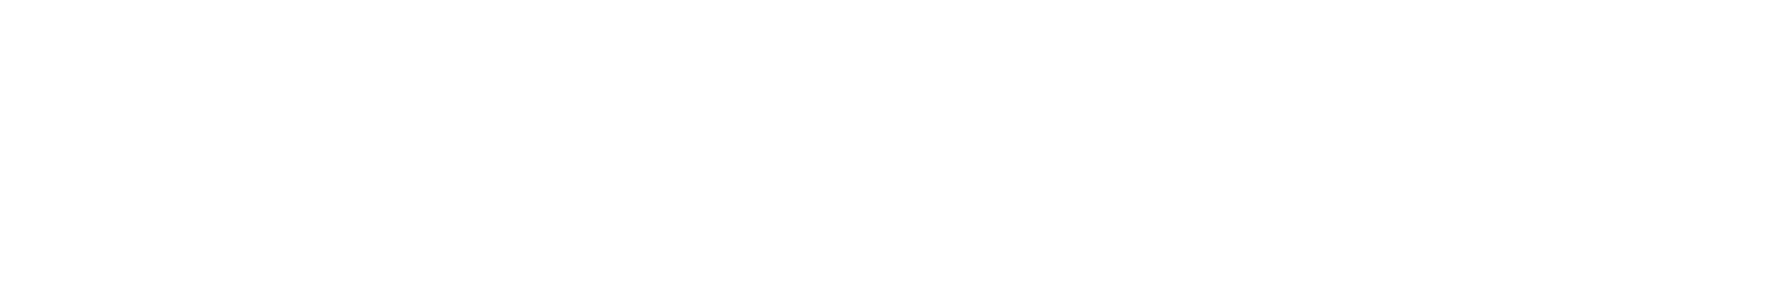 cirguz-logo-white-on-trans